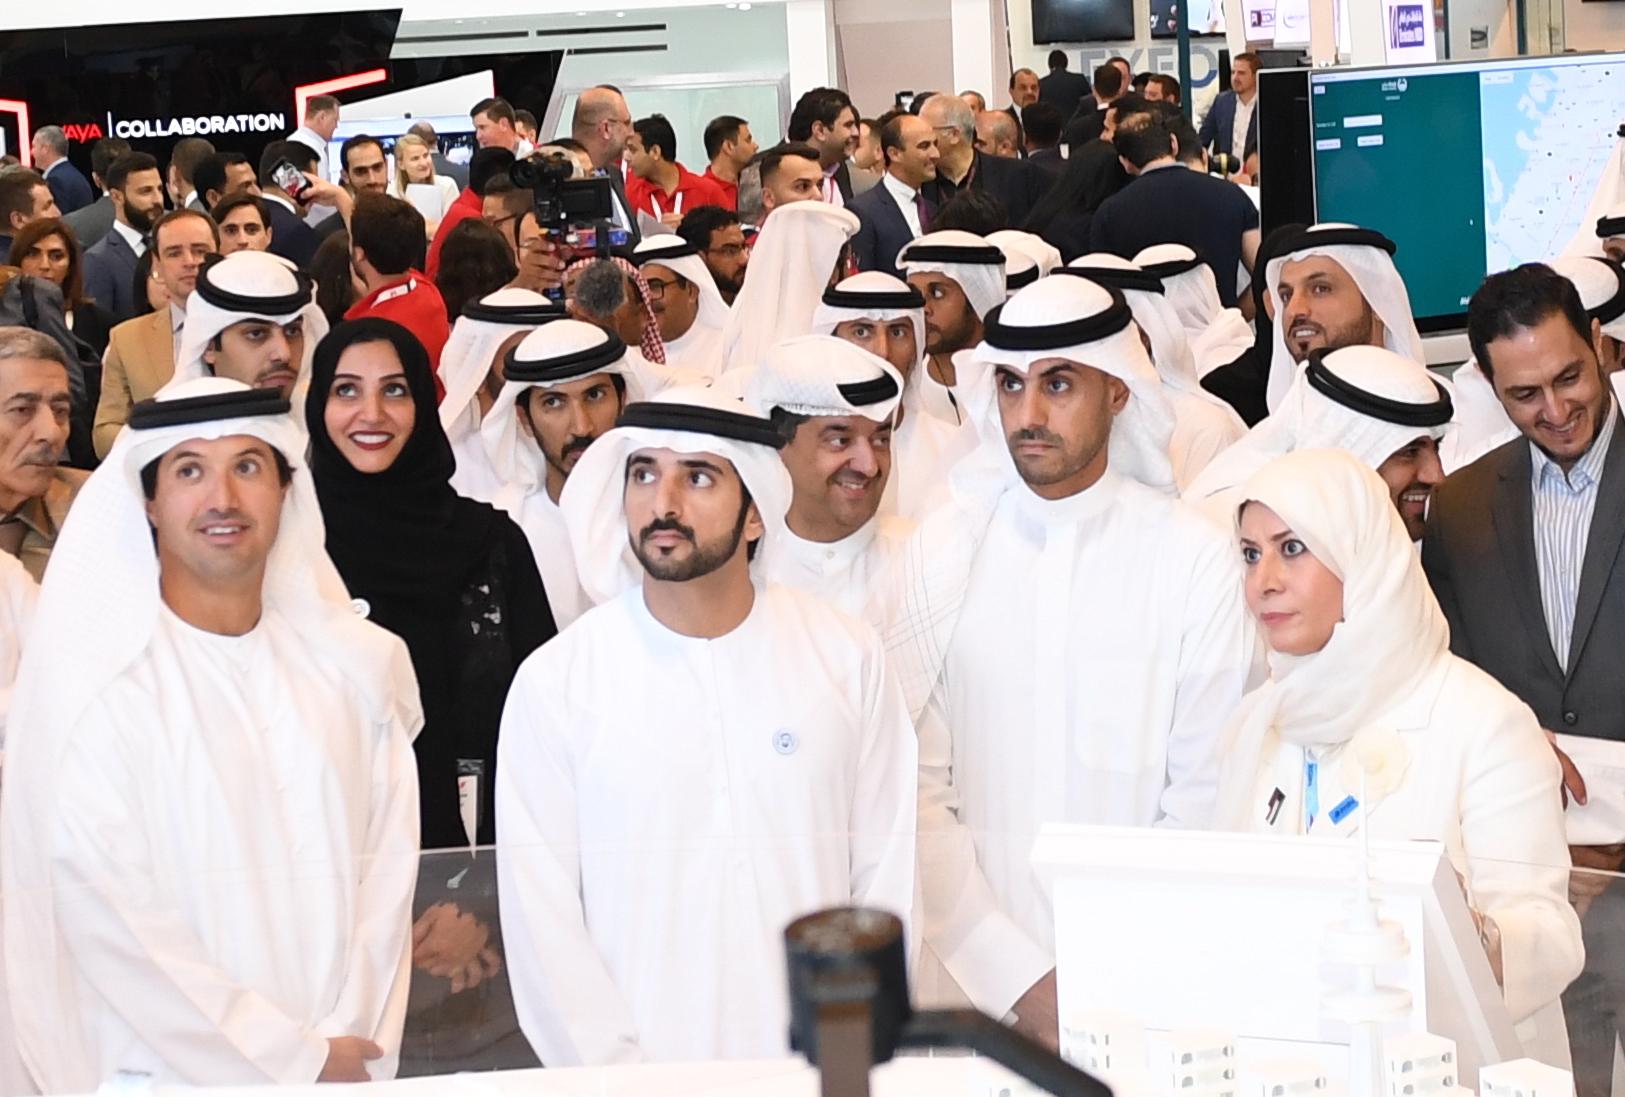 Zain showcases its digital capabilities at GITEX, advocating